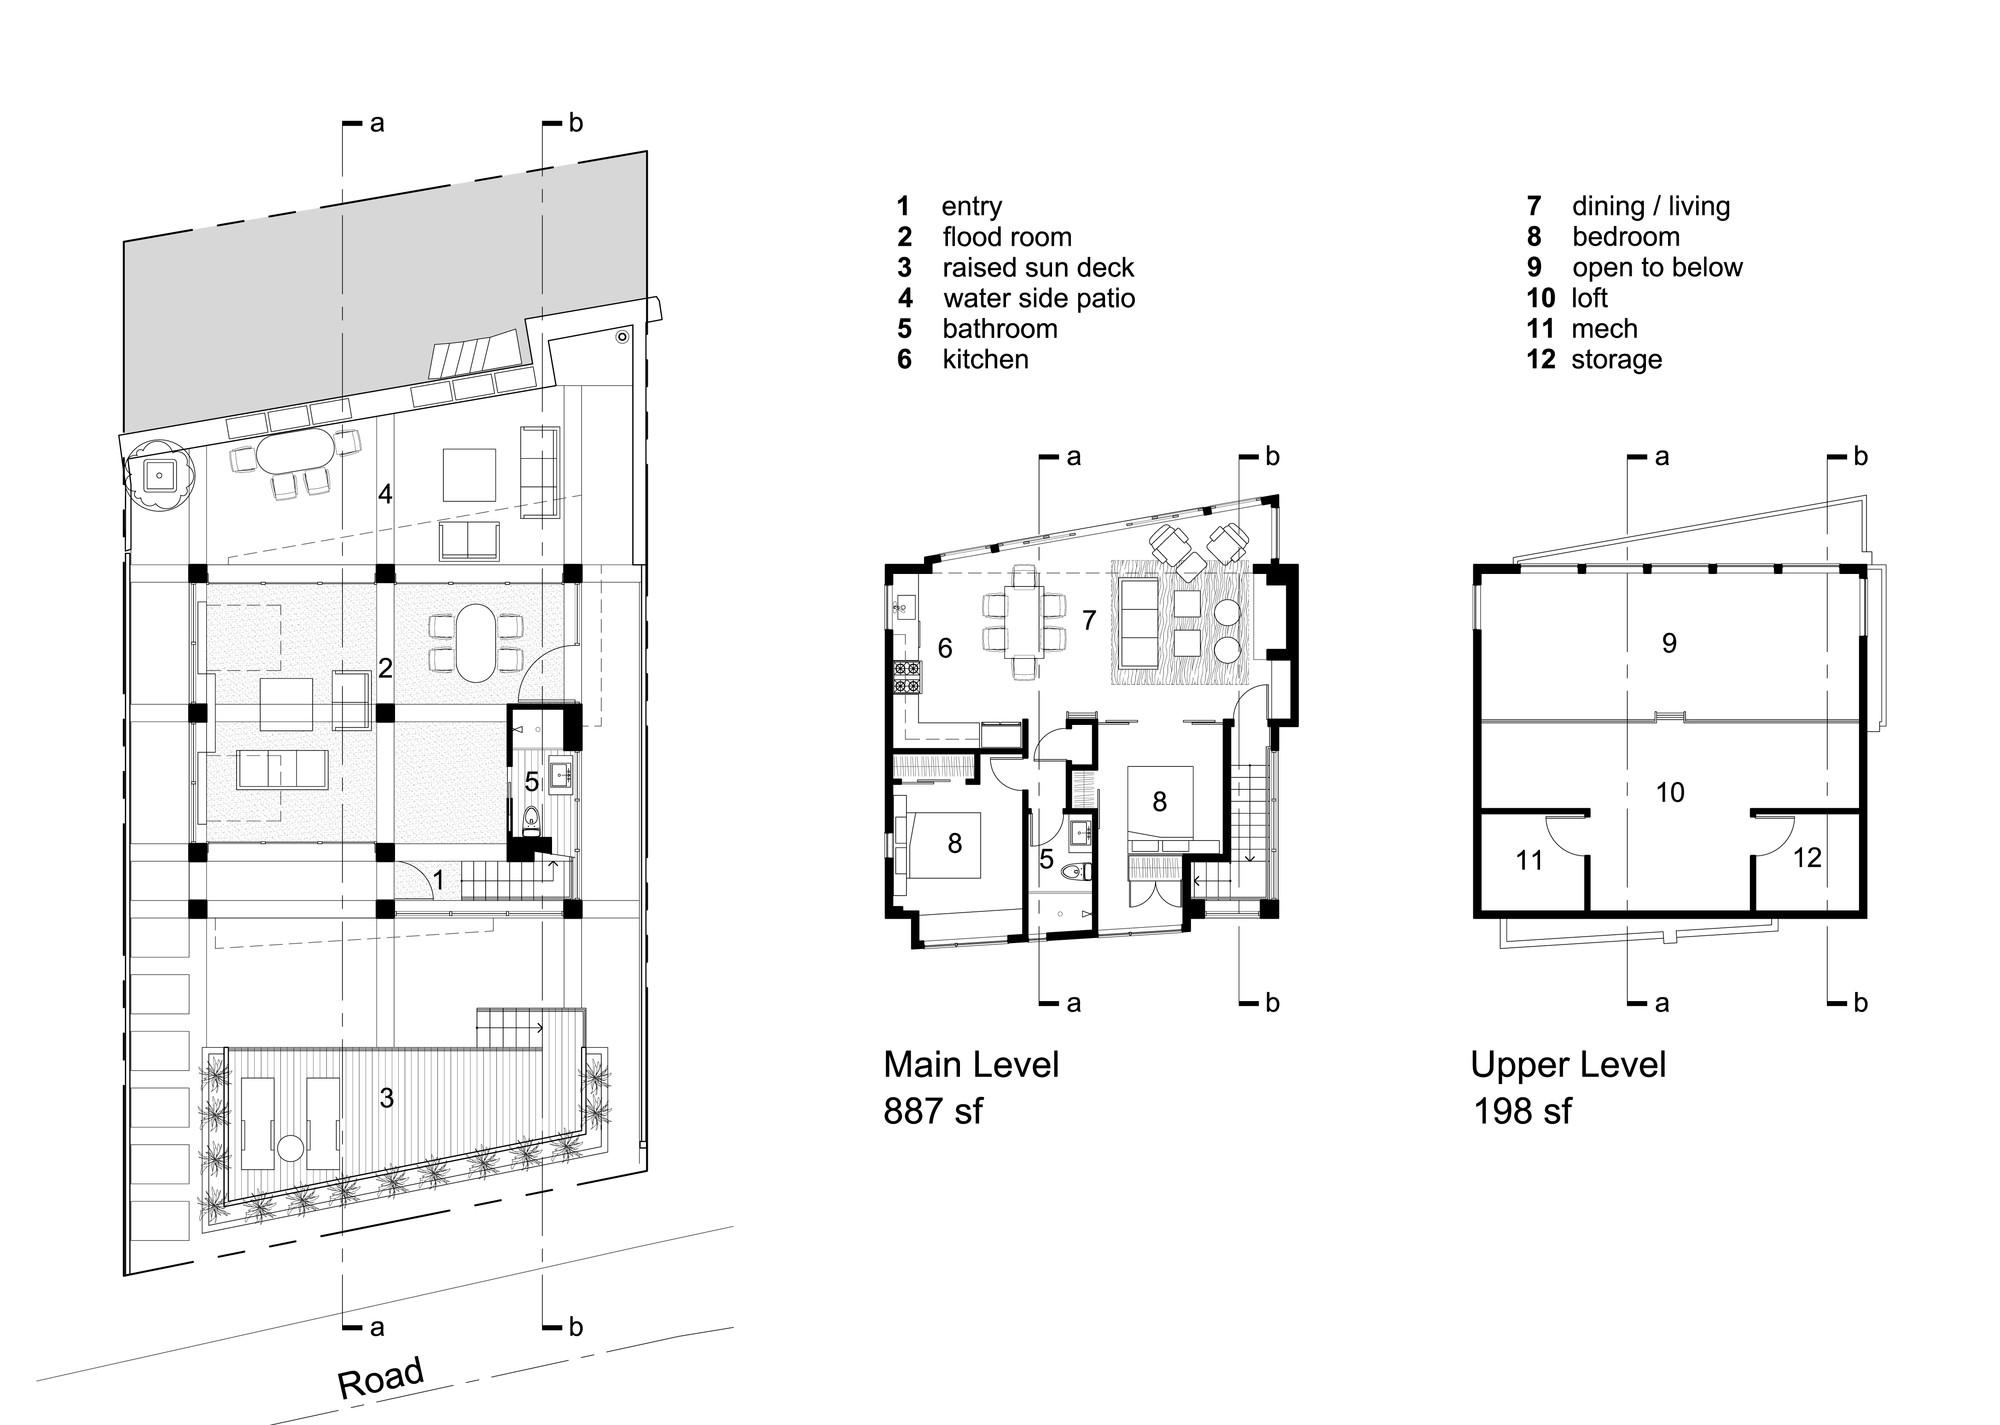 Tsunami house designs northwest architect archdaily for Northwest floor plans